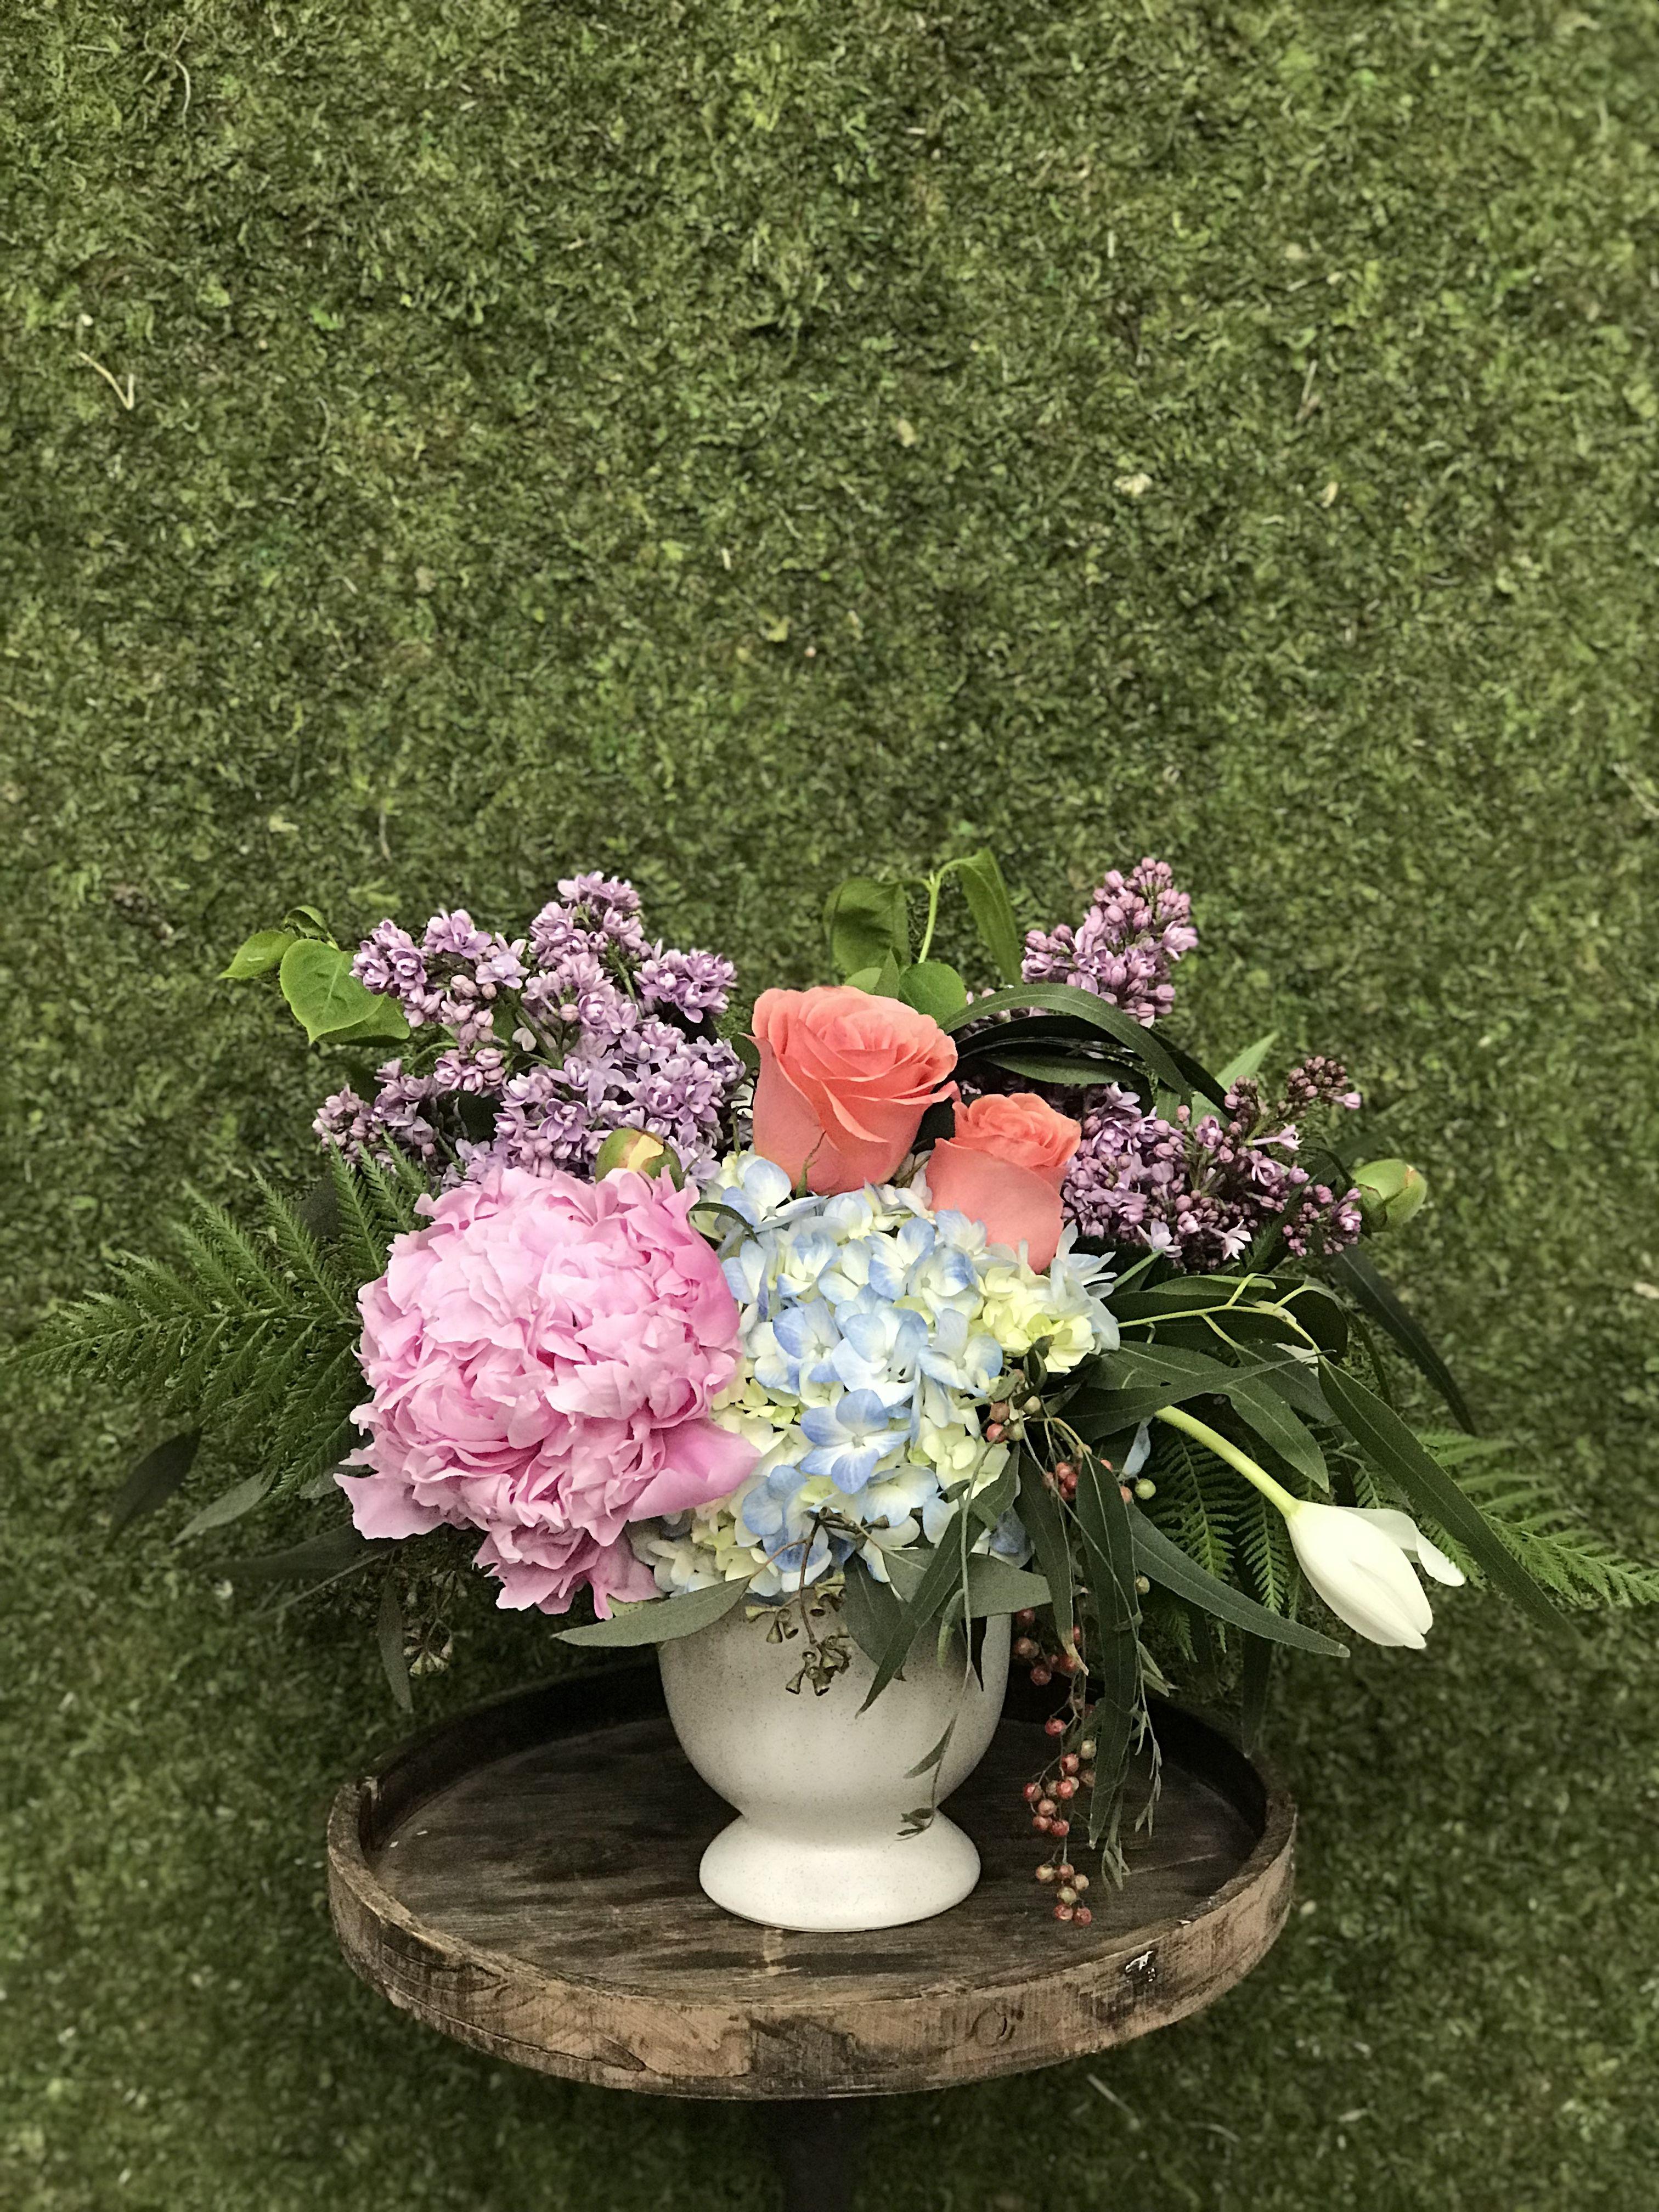 Happiness In A Vase - #Florist #Rochesterflorist #Floristrochesterny #Summerflowers #Nyflorist